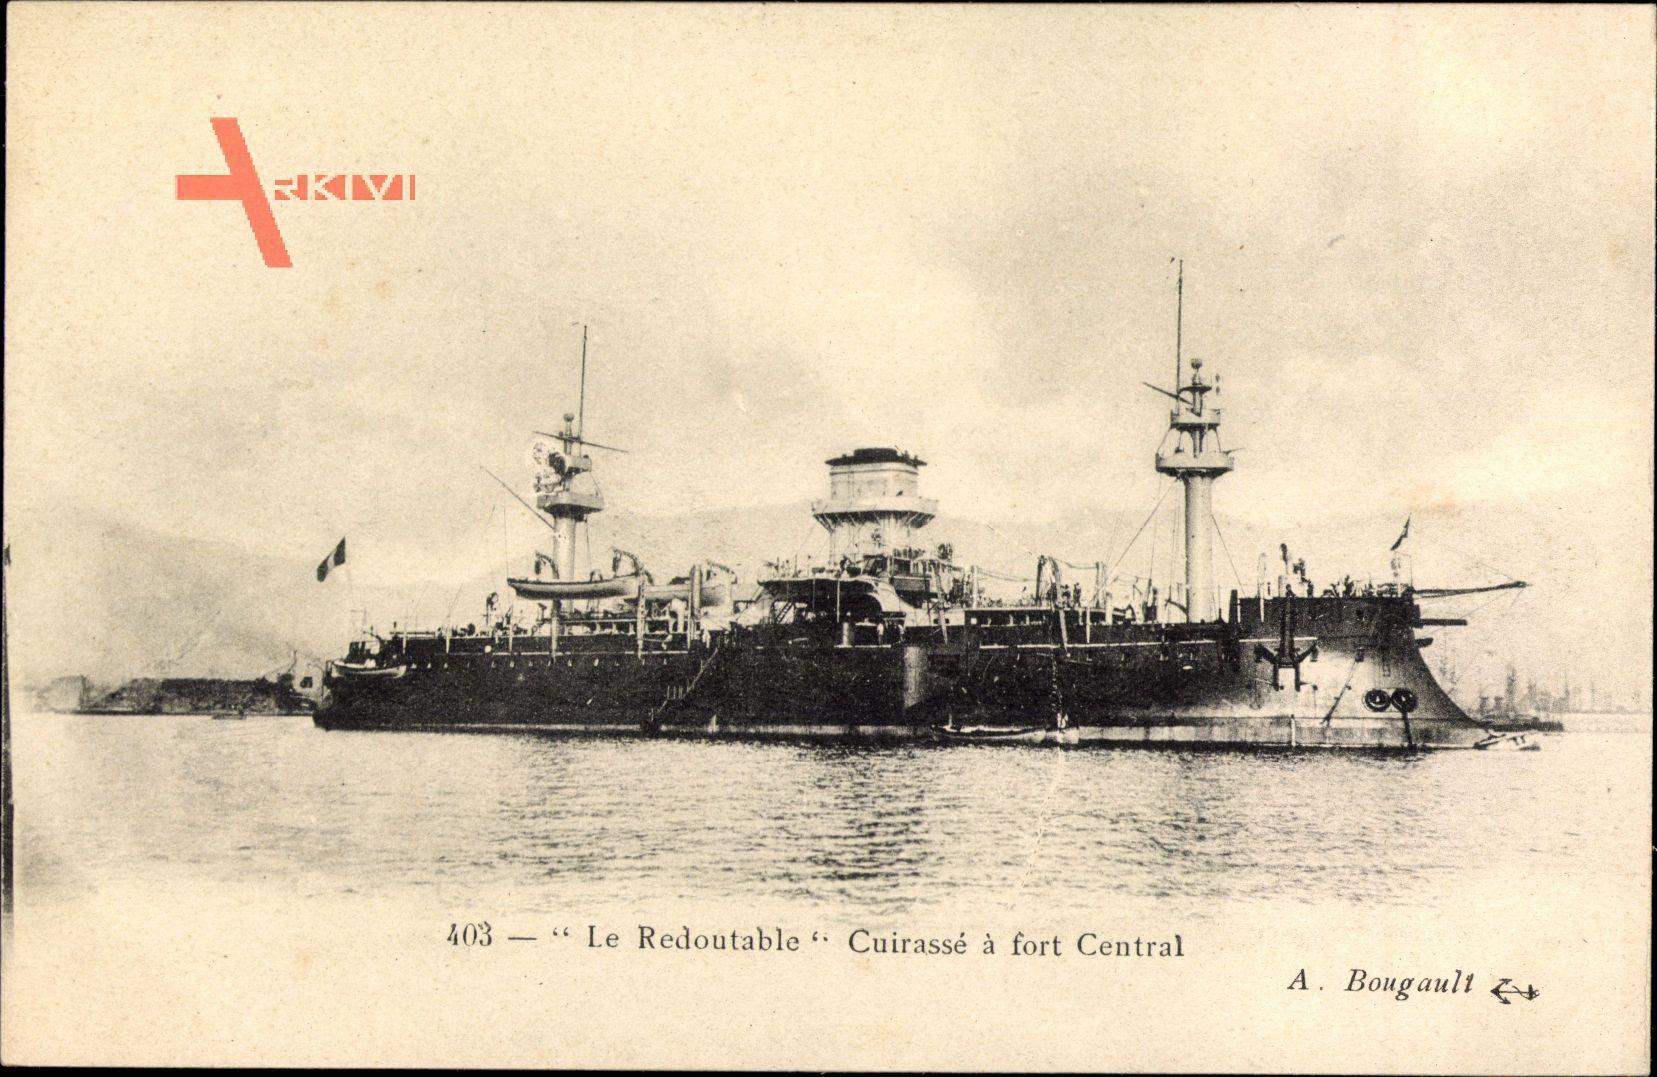 Französisches Kriegsschiff, Redoutable, Cuirassé à fort Central